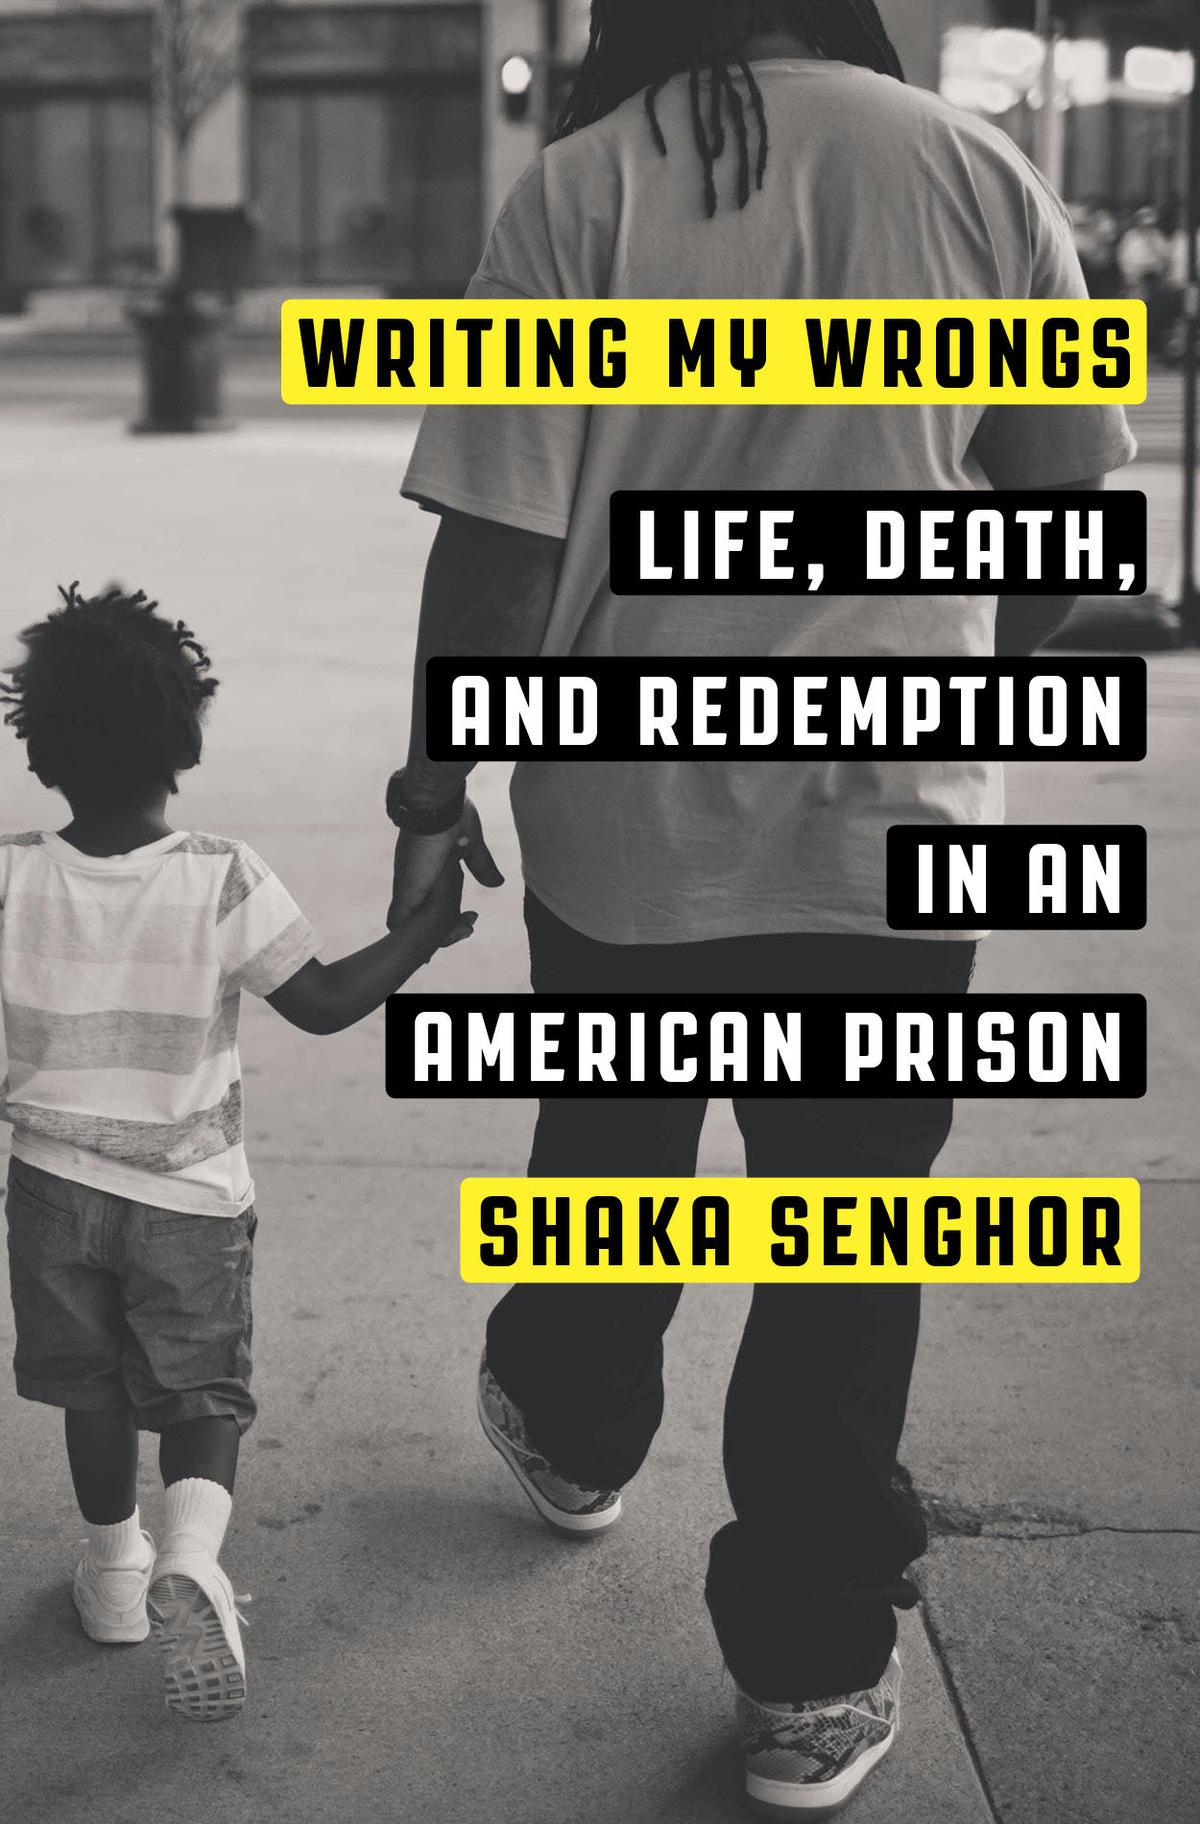 writing my wrongs shaka senghor